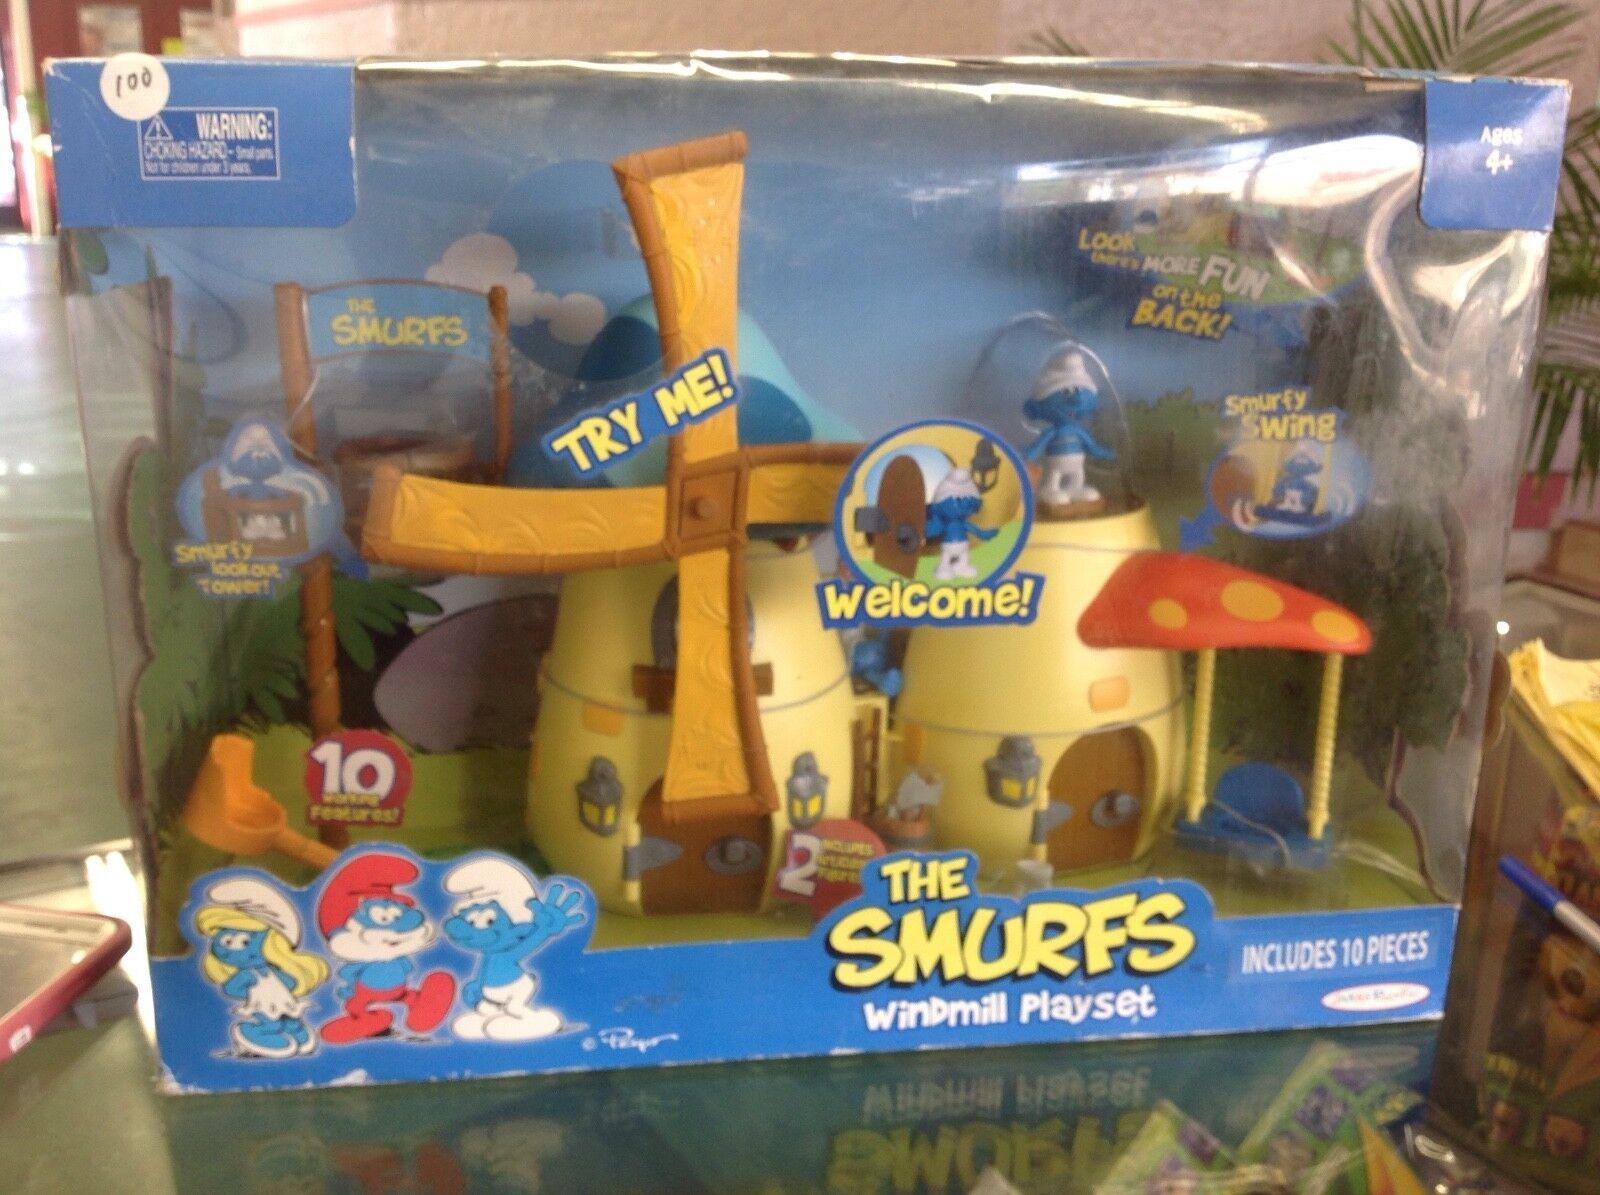 2009 Smurfs WINDMILL PLAYSET - with box - - Jakks Pacific